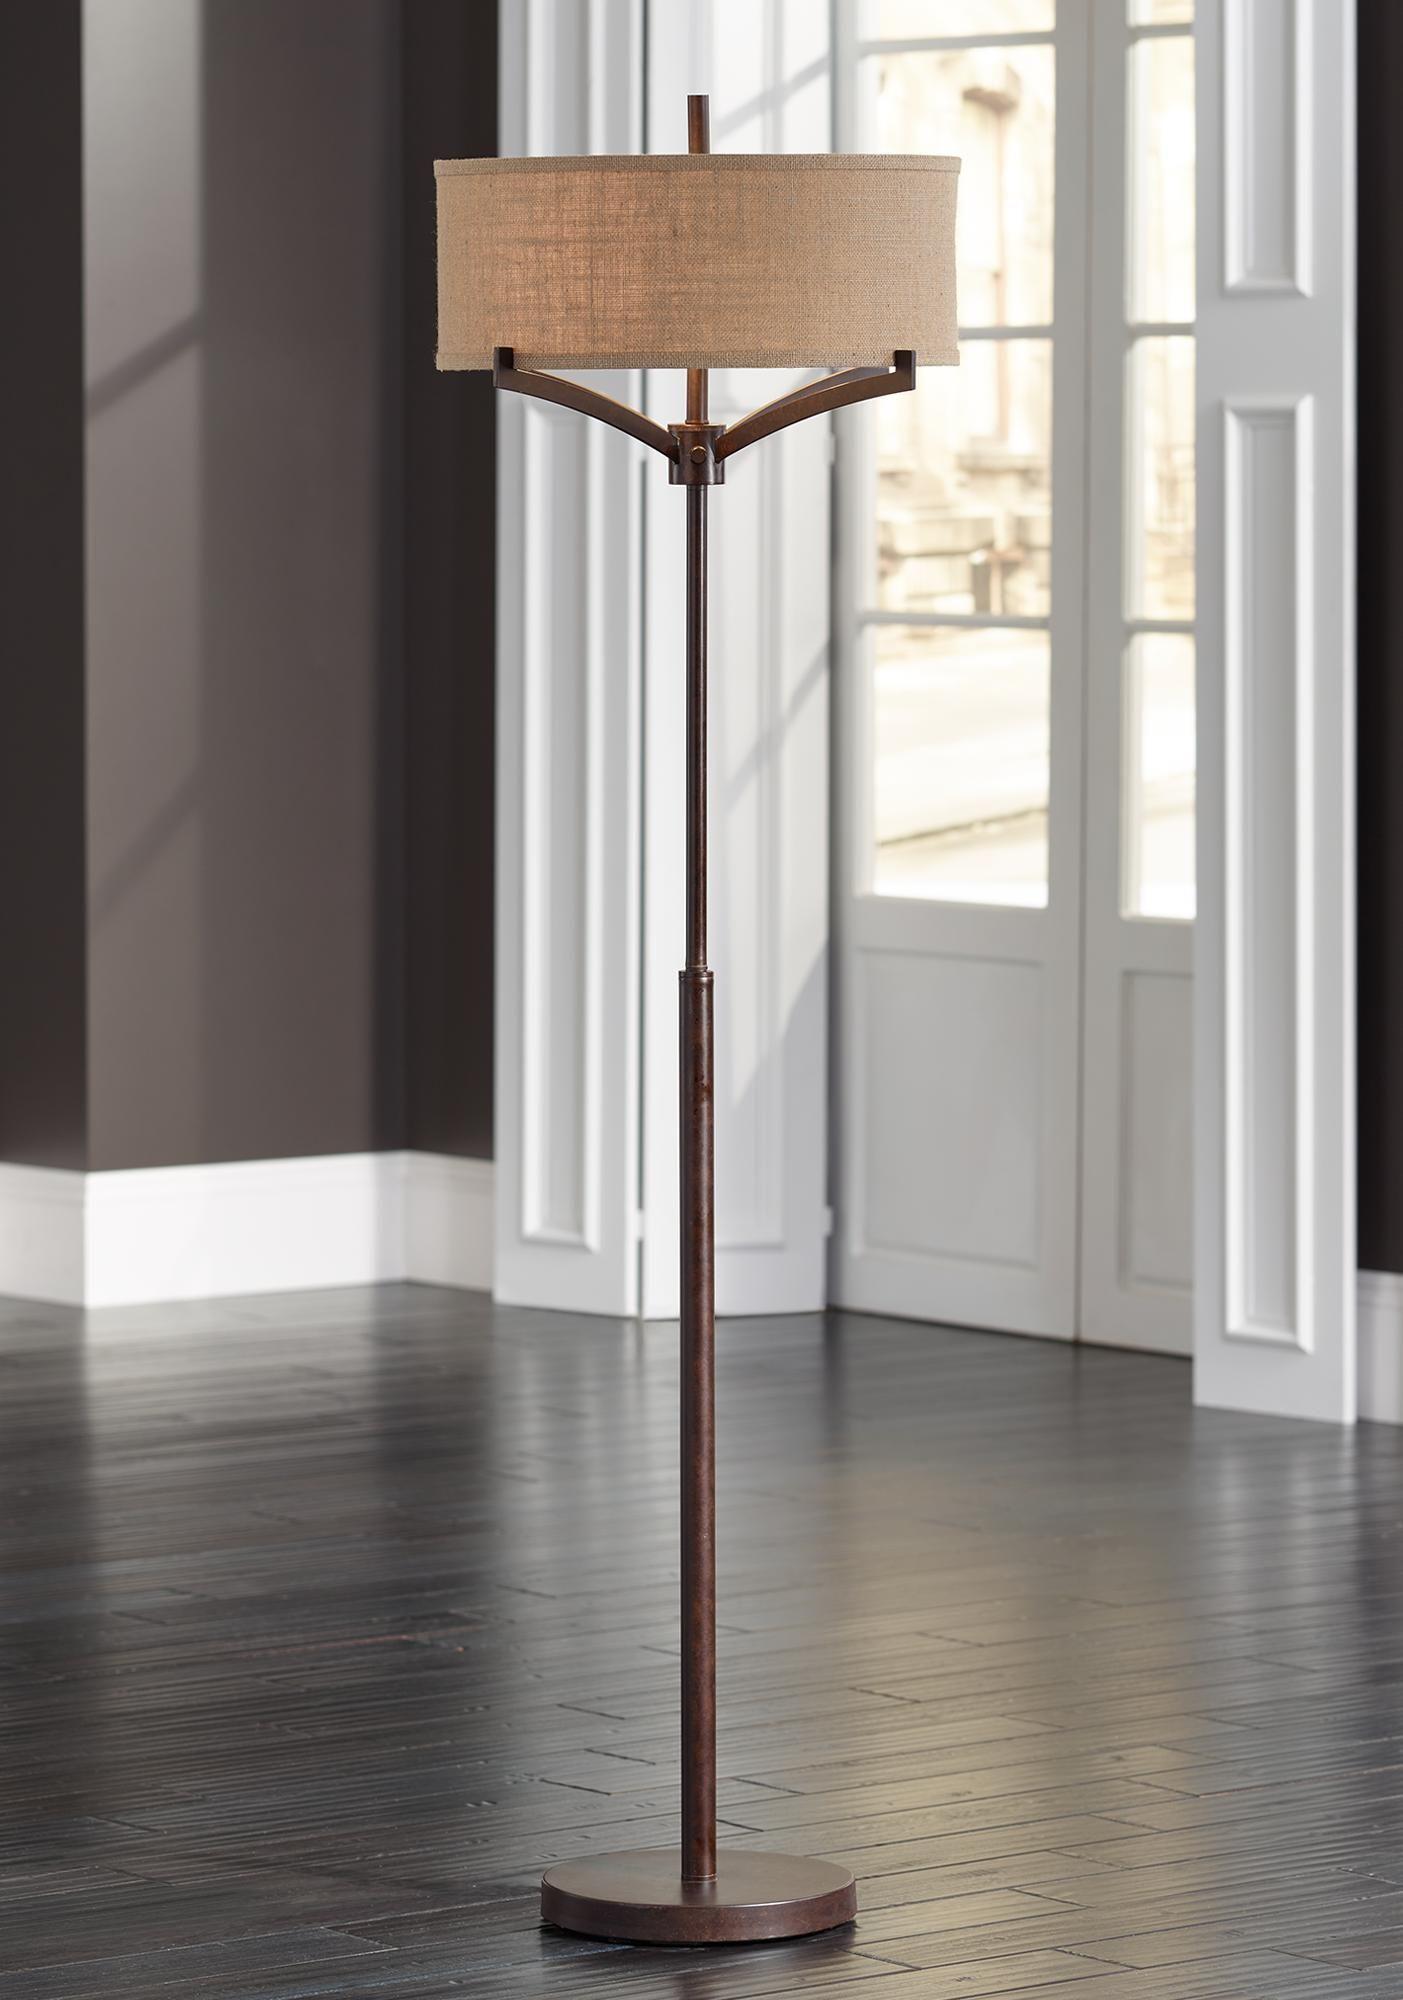 Franklin Iron Works Tremont Floor Lamp With Burlap Shade Modern Floor Lamp Design Modern